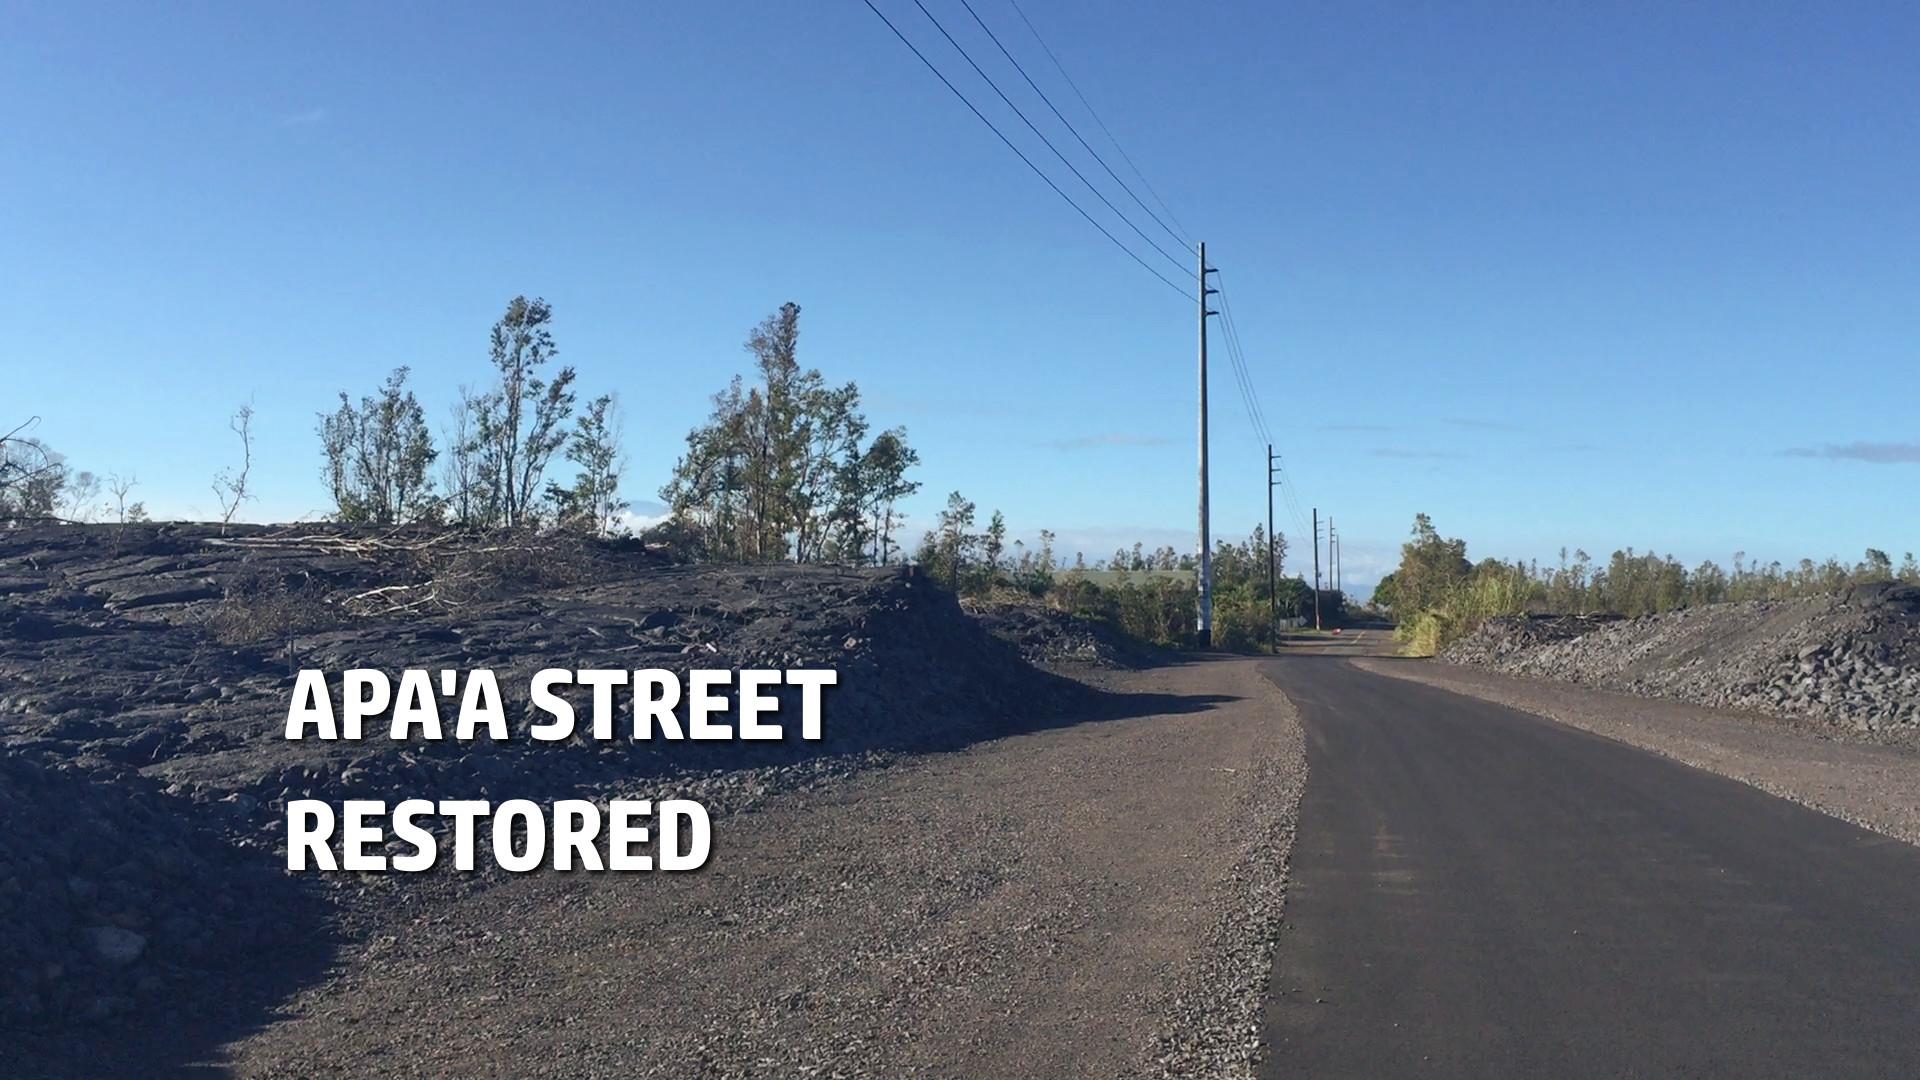 VIDEO: Pahoa's Apaa Street Restored Following 2014 Lava Flow